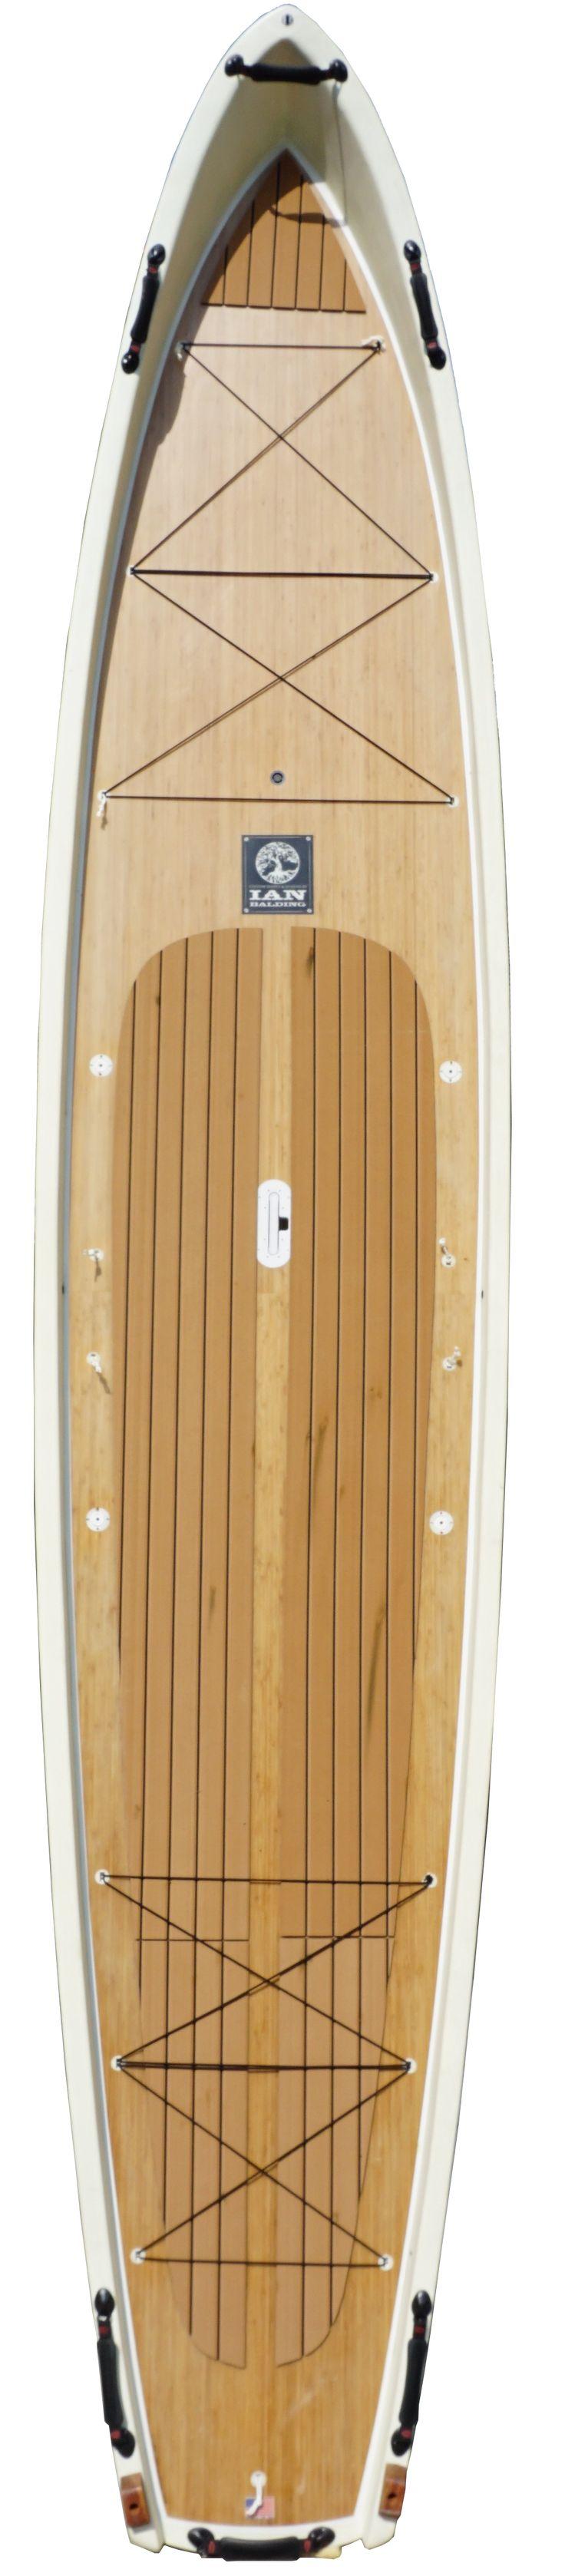 Best 25 Paddle Boarding Ideas On Pinterest Paddle